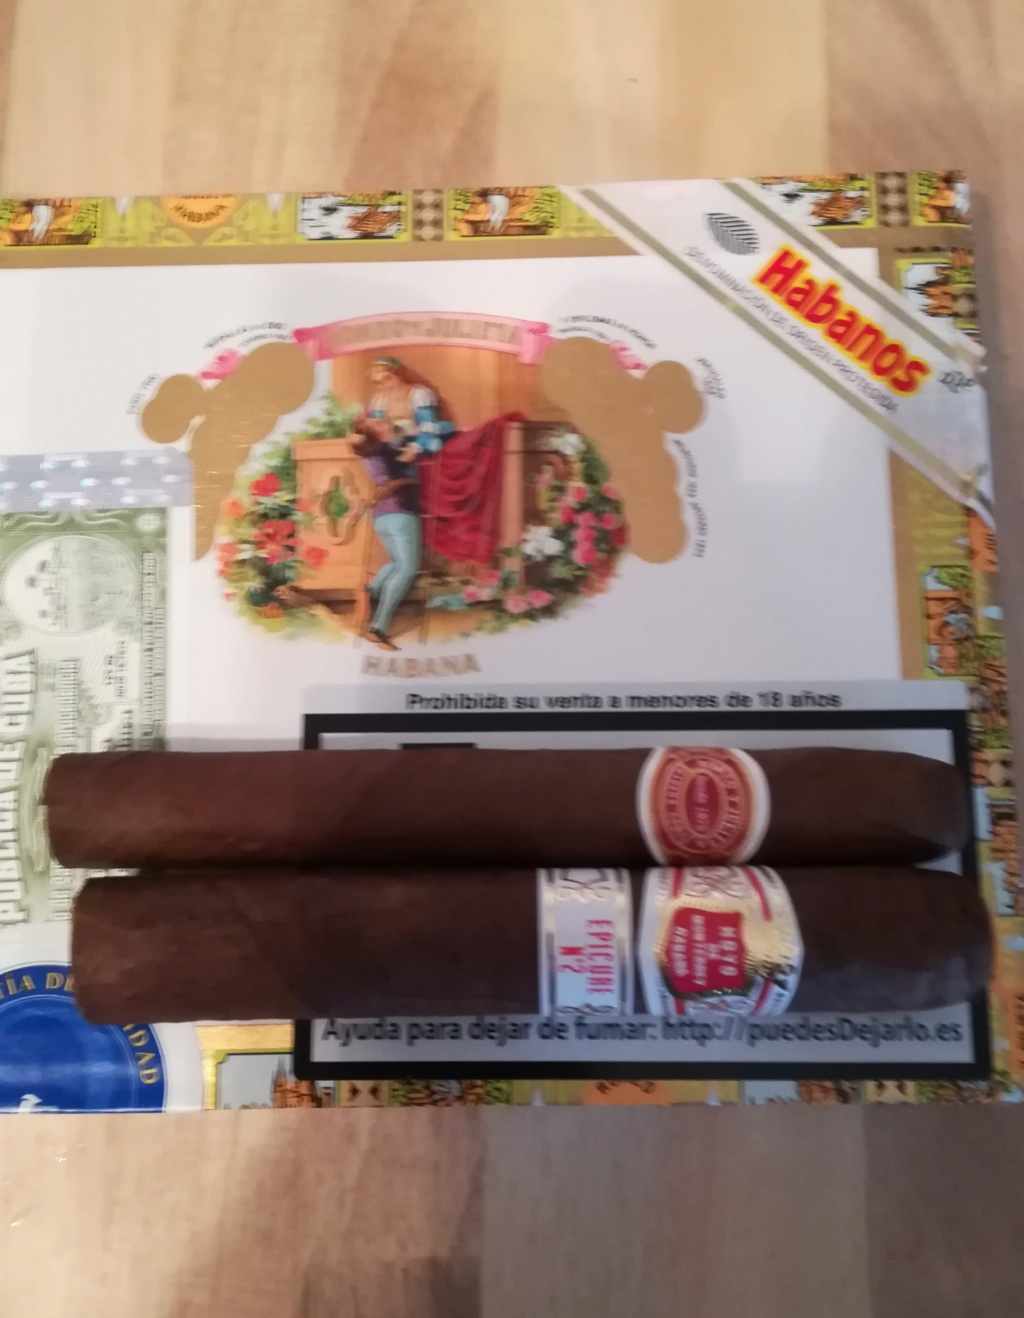 27 Avril 19 bouffardes et tabacs du samedi Img_2044